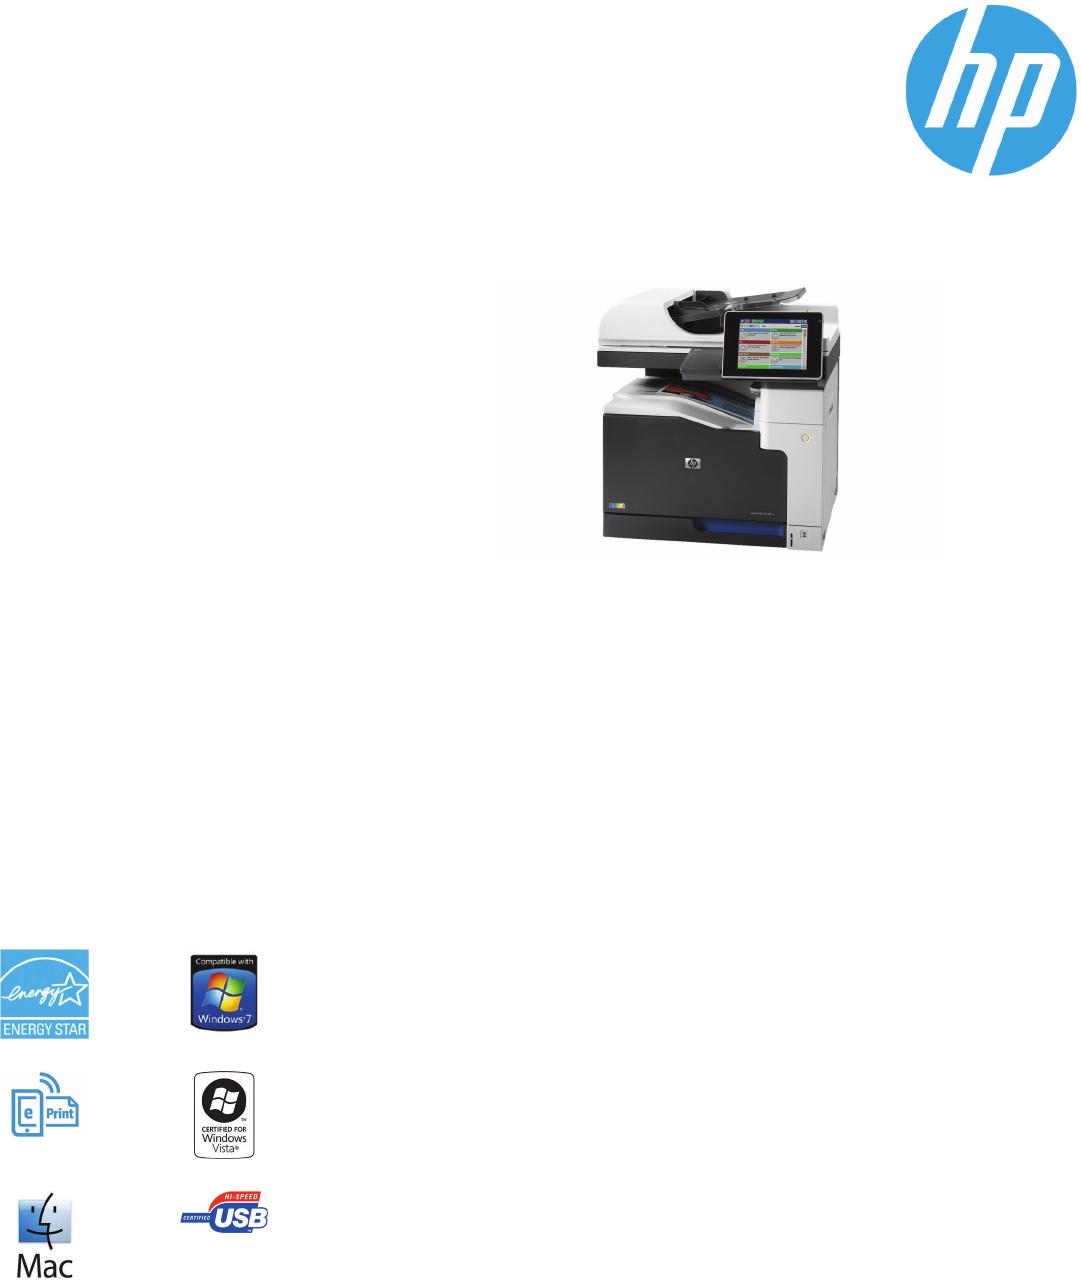 Datasheet HP LaserJet Enterprise 700 color MFP M775dn